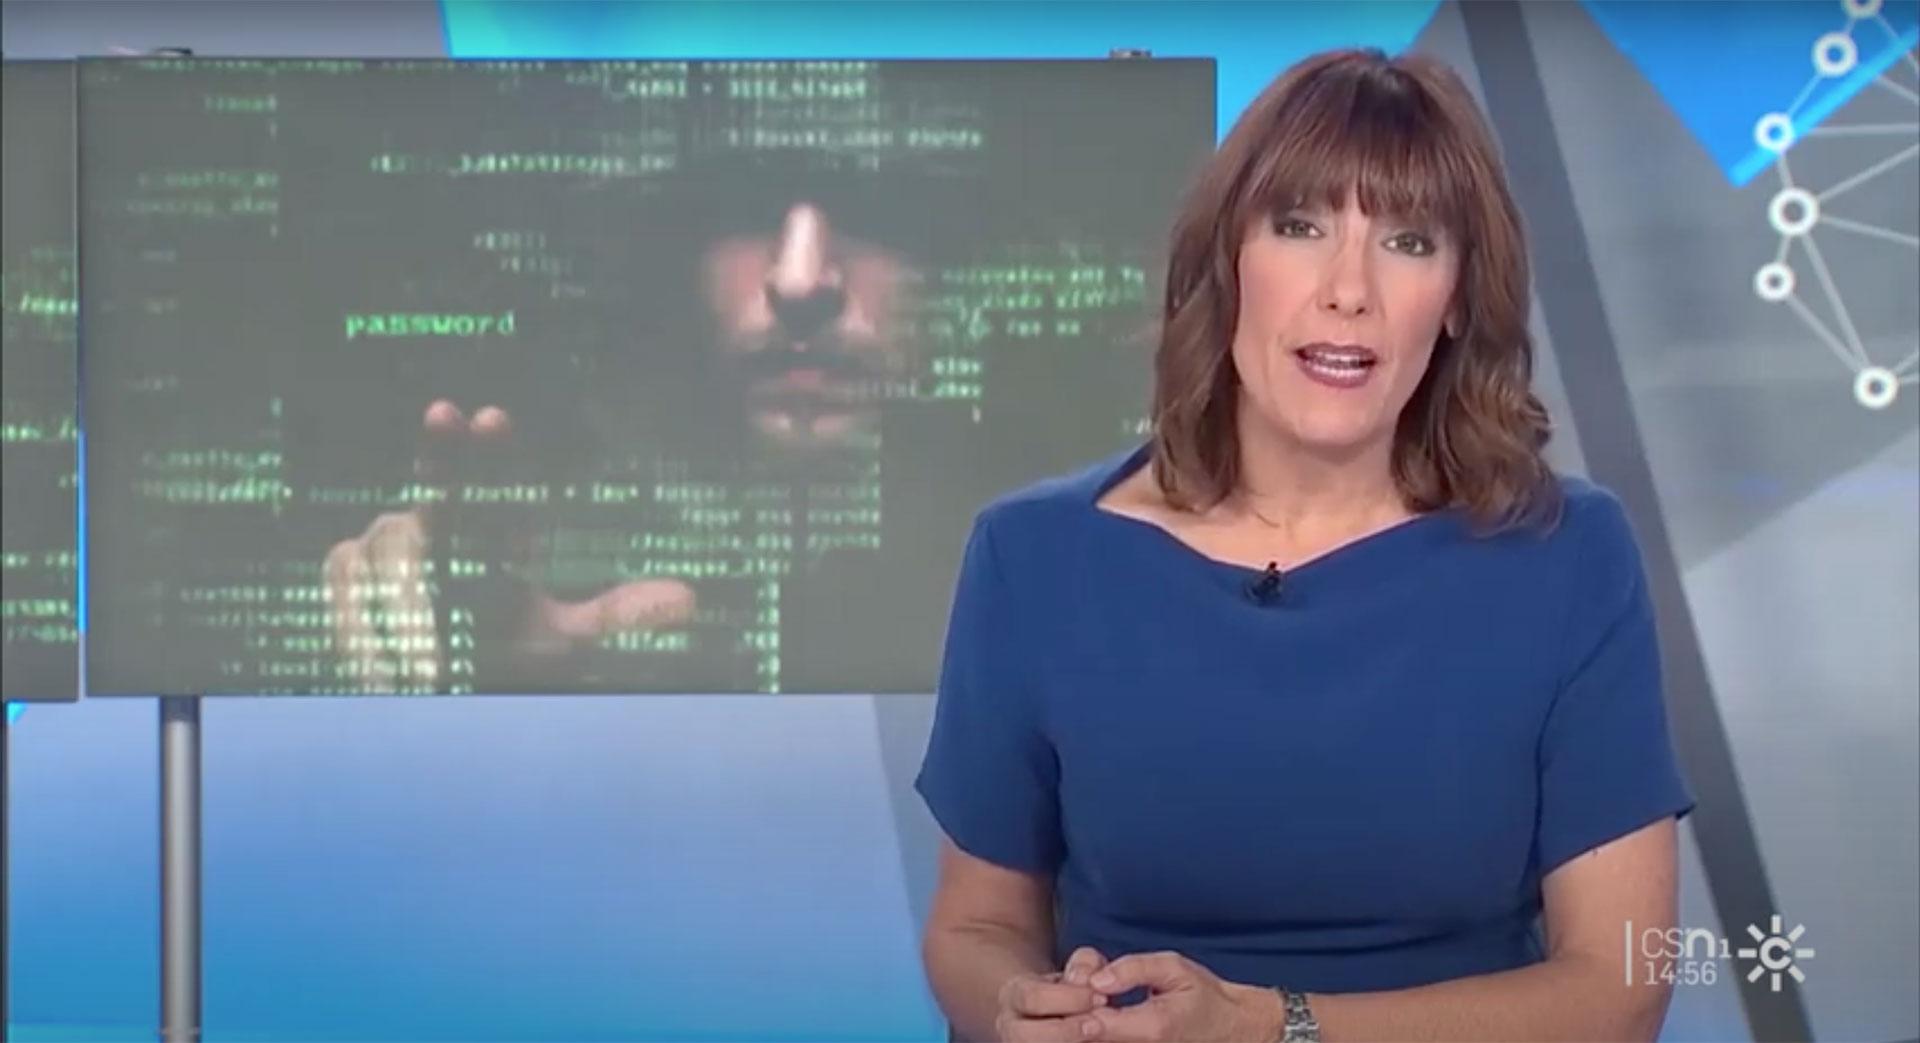 Ciberseguridad-Jerez